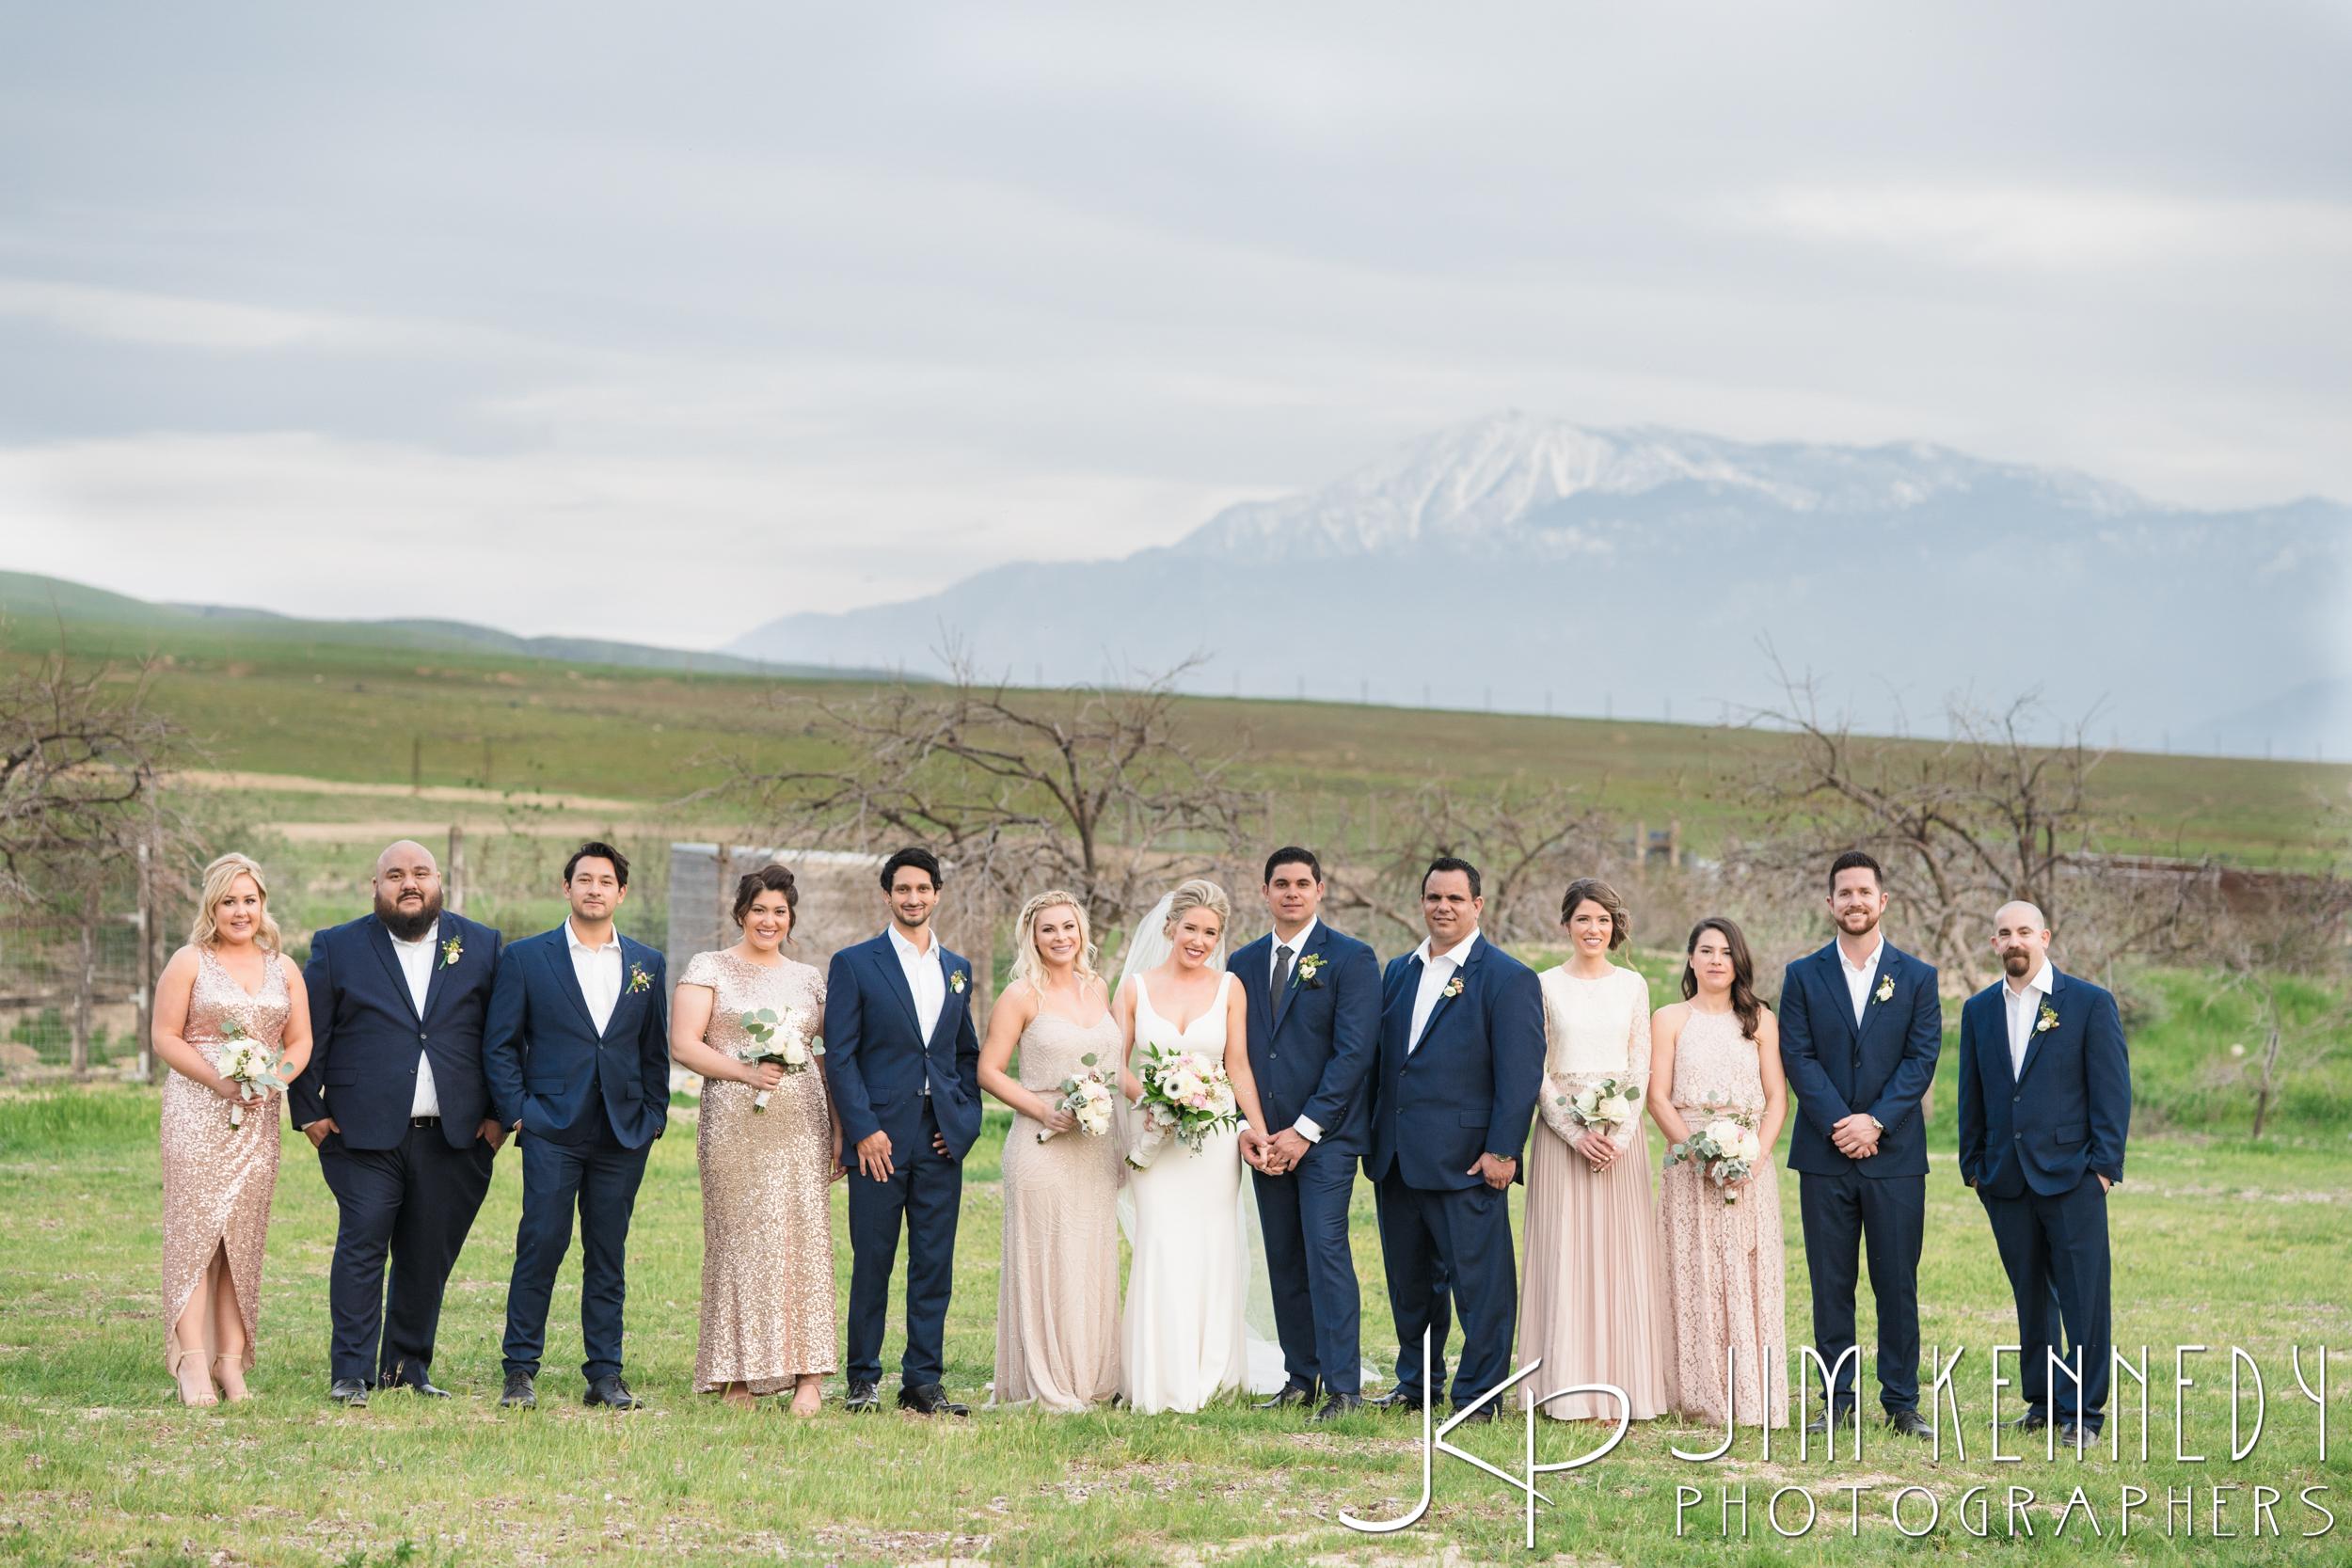 jim_kennedy_photographers_highland_springs_wedding_caitlyn_0133.jpg